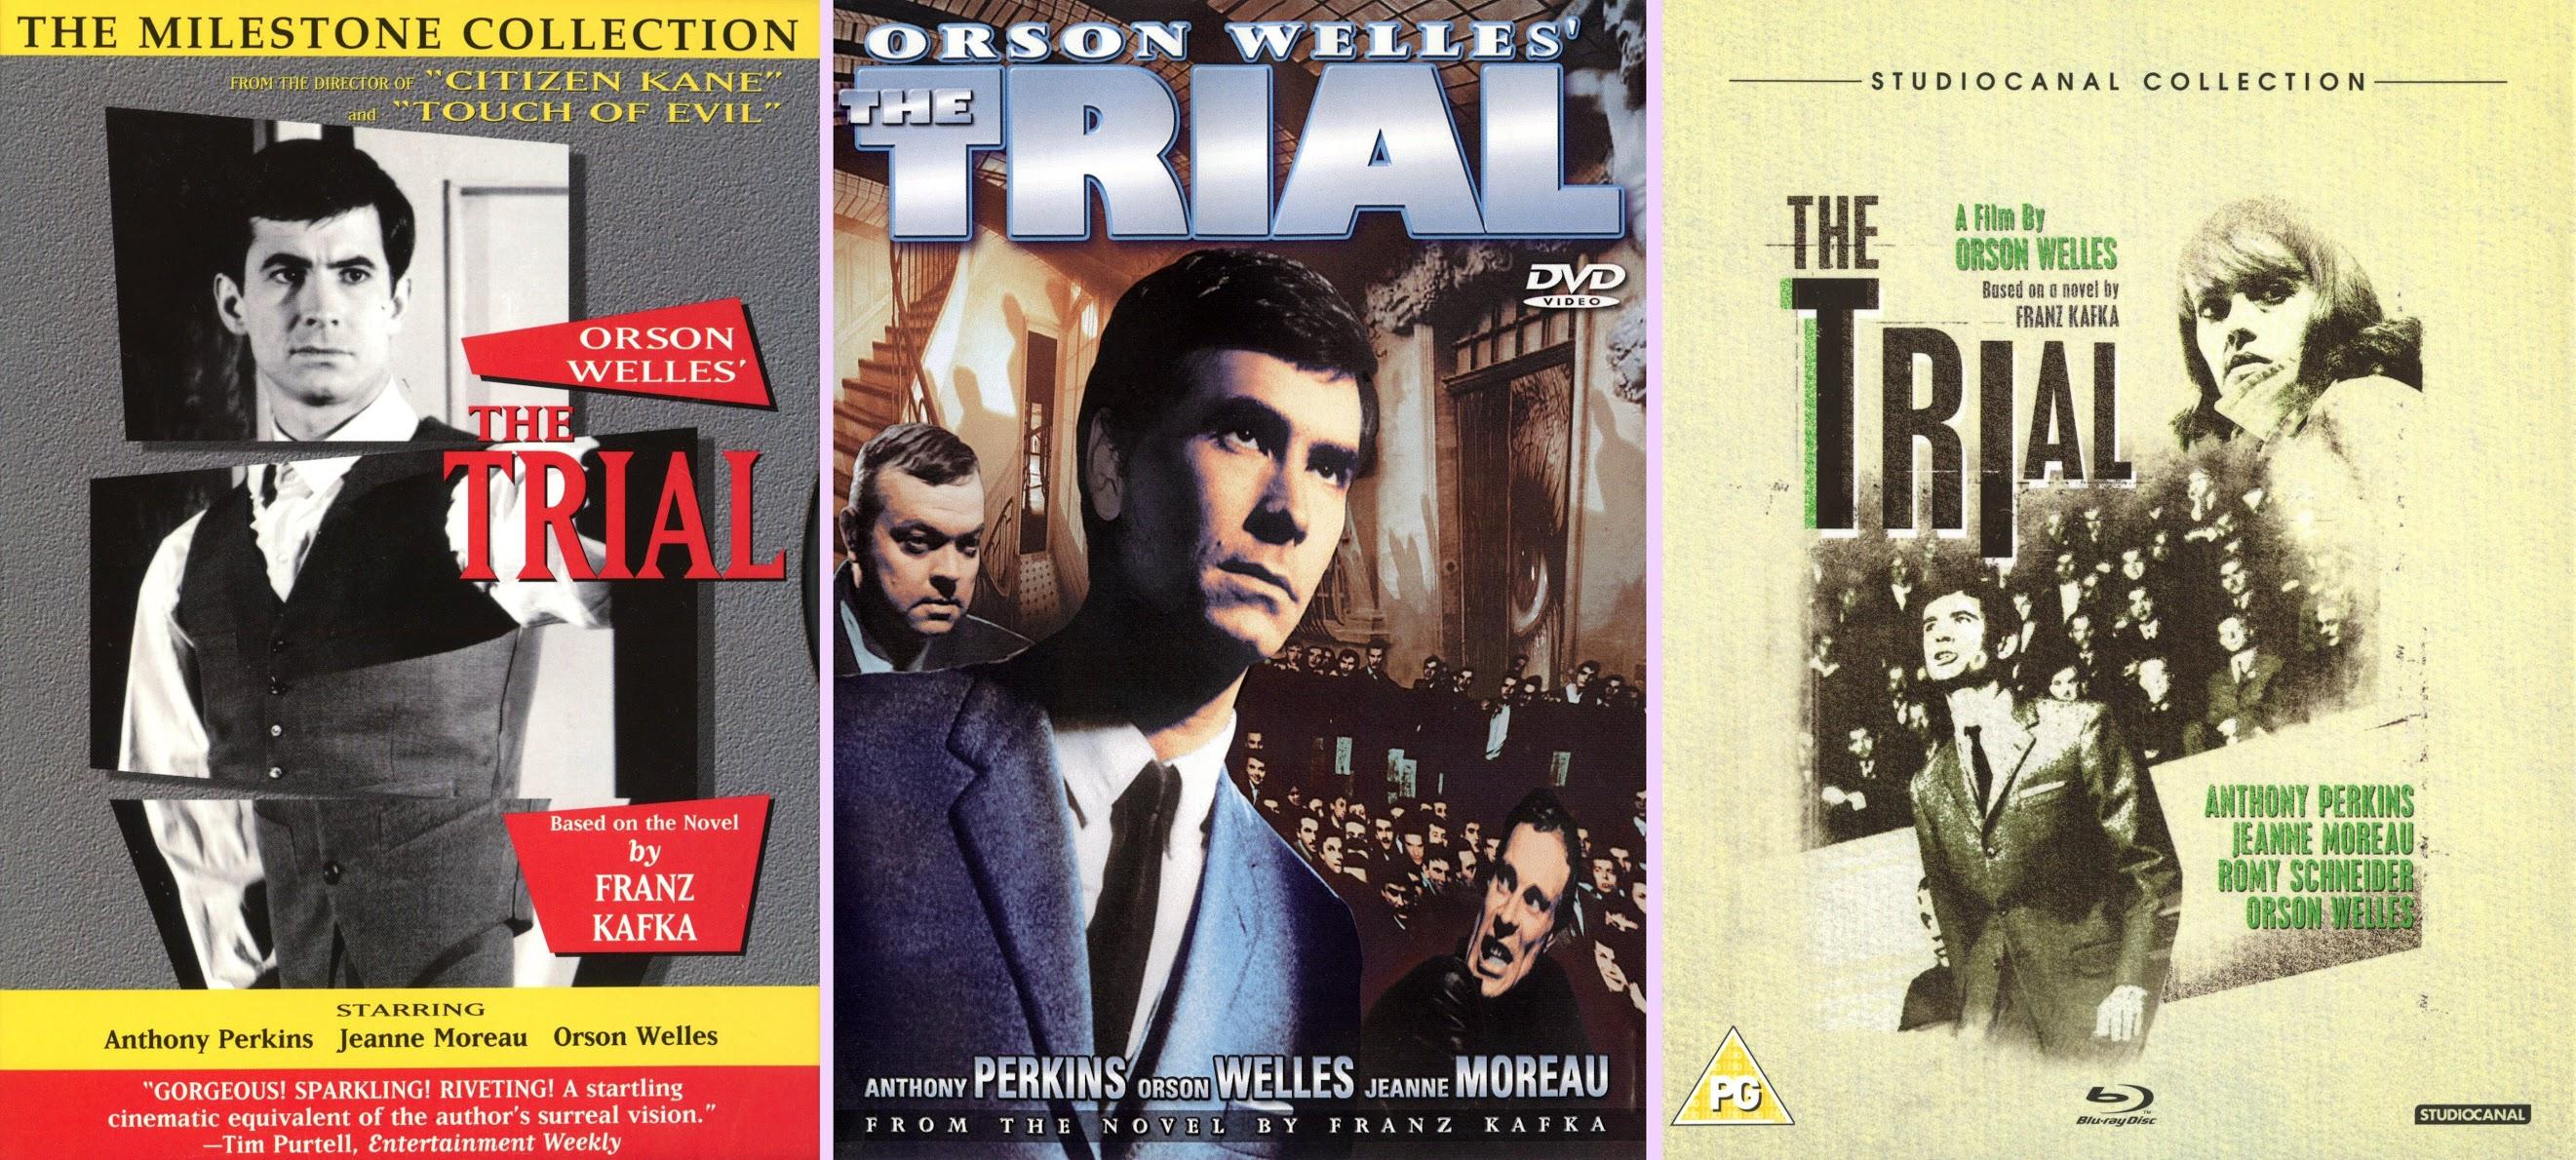 DVD Exotica: Orson Welles' The Trial (DVD/ Blu-ray Comparison)